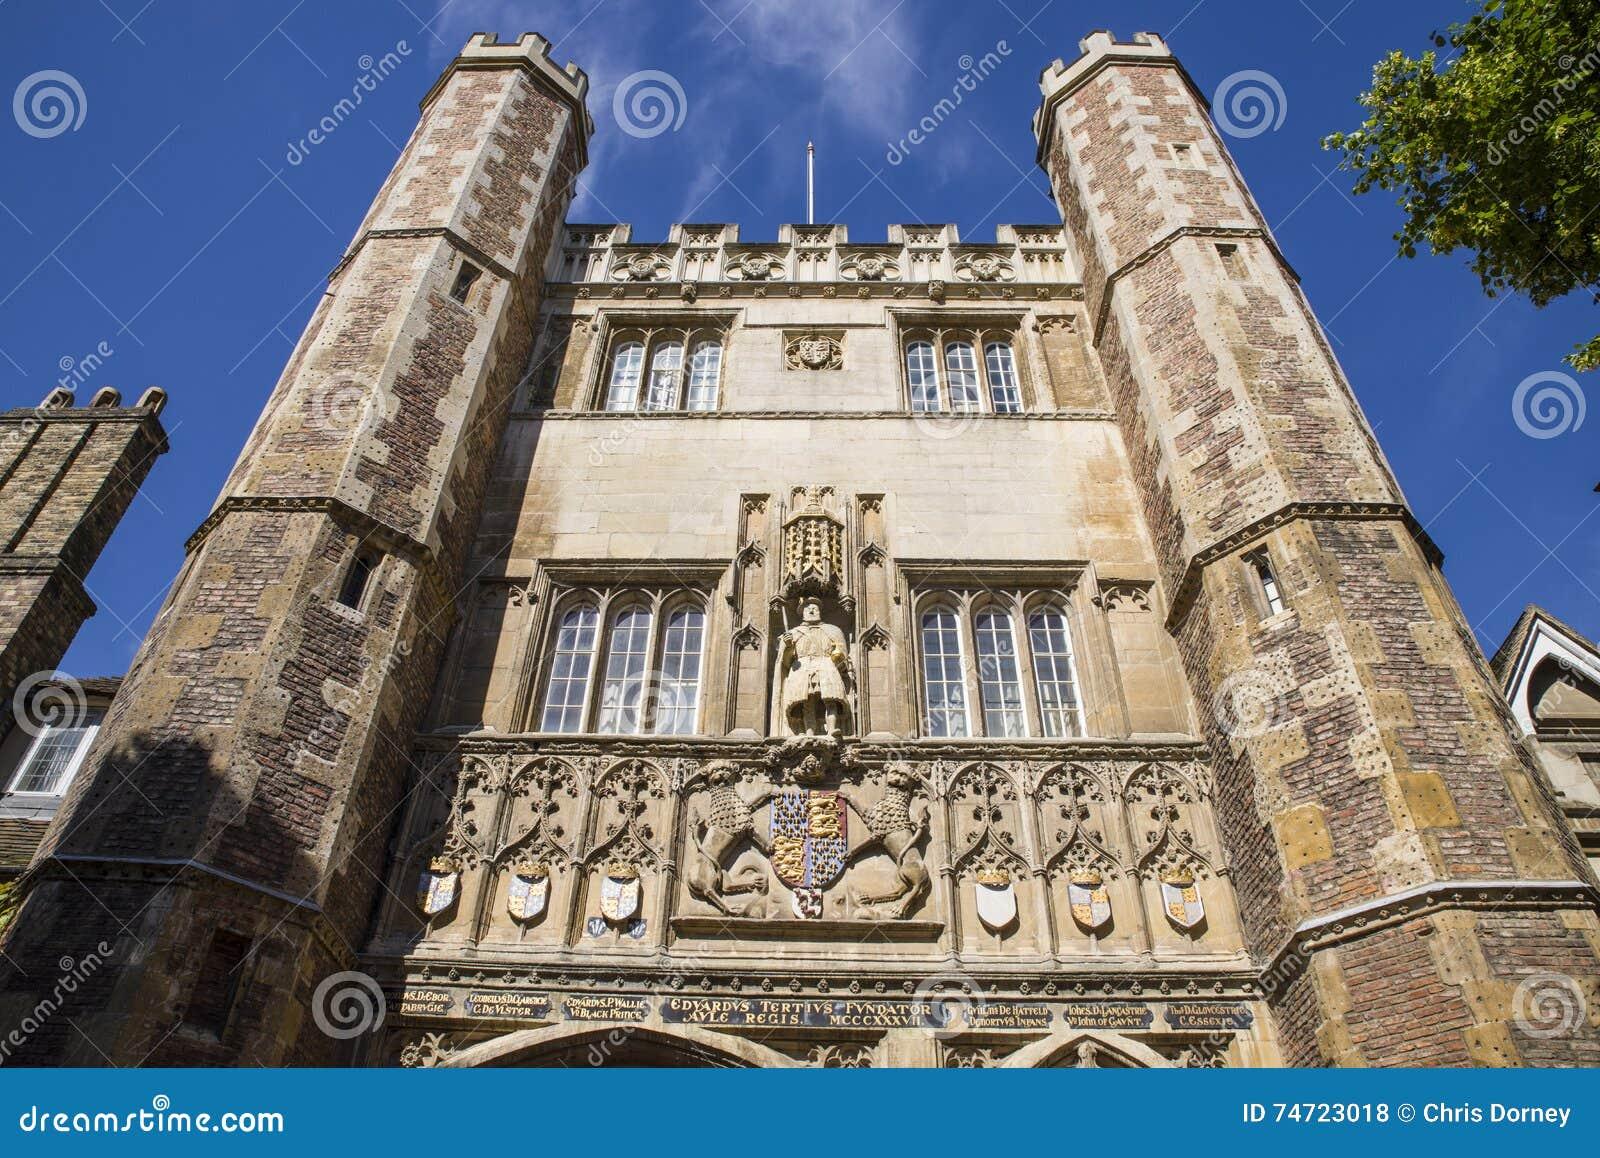 King Henry VIII At Trinity College Cambridge Stock ...